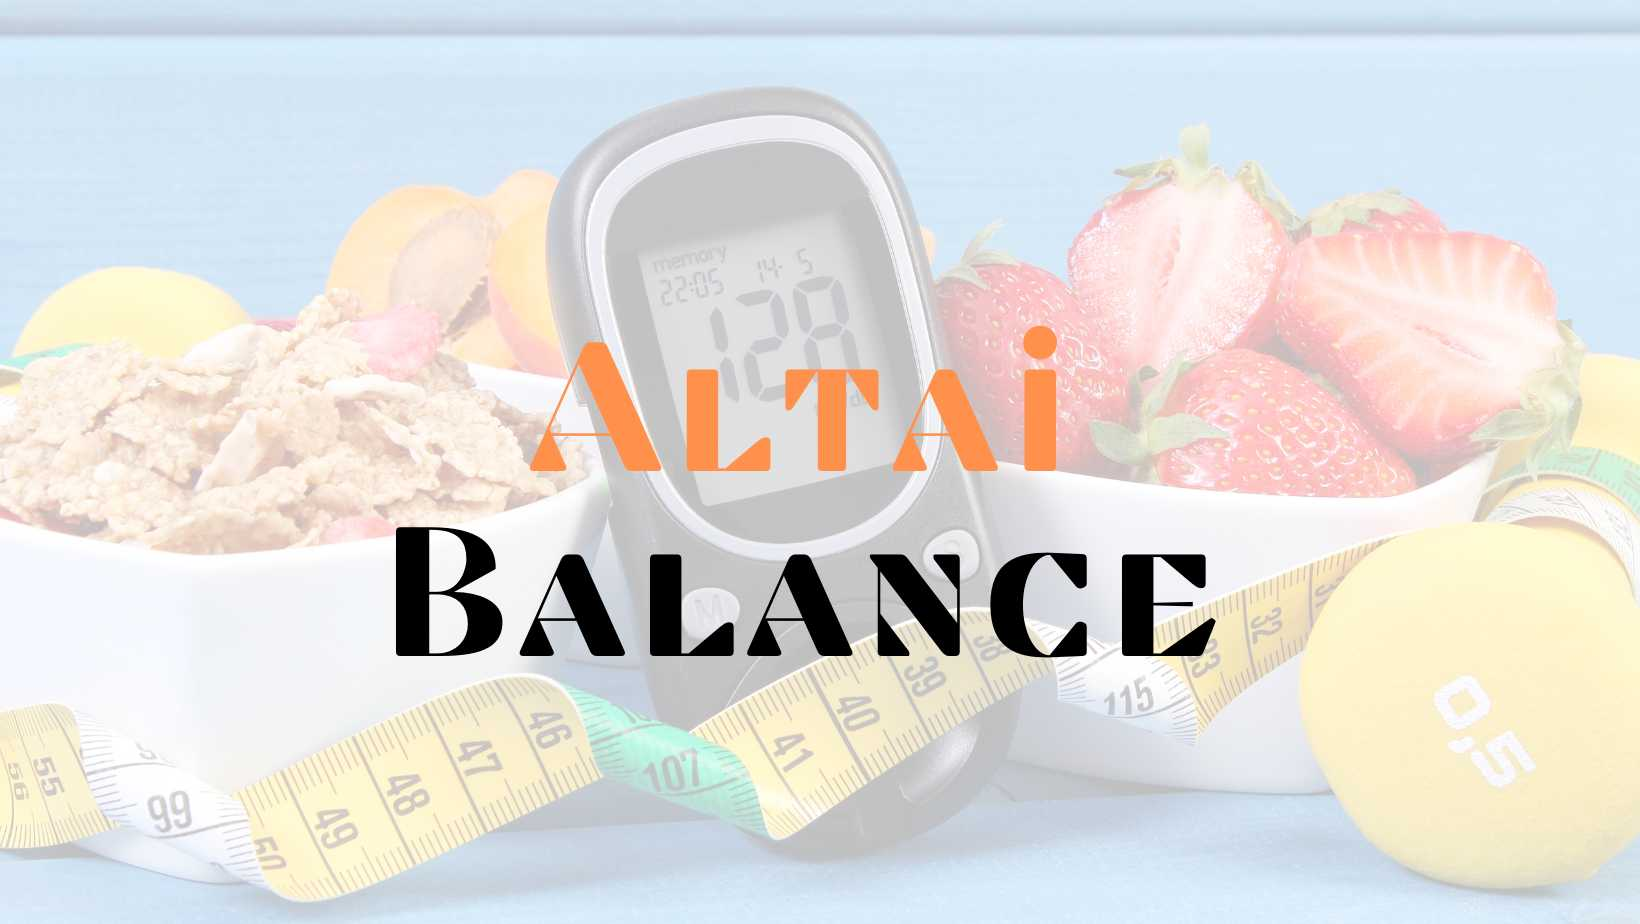 Altai Balance Supplement Profile Picture